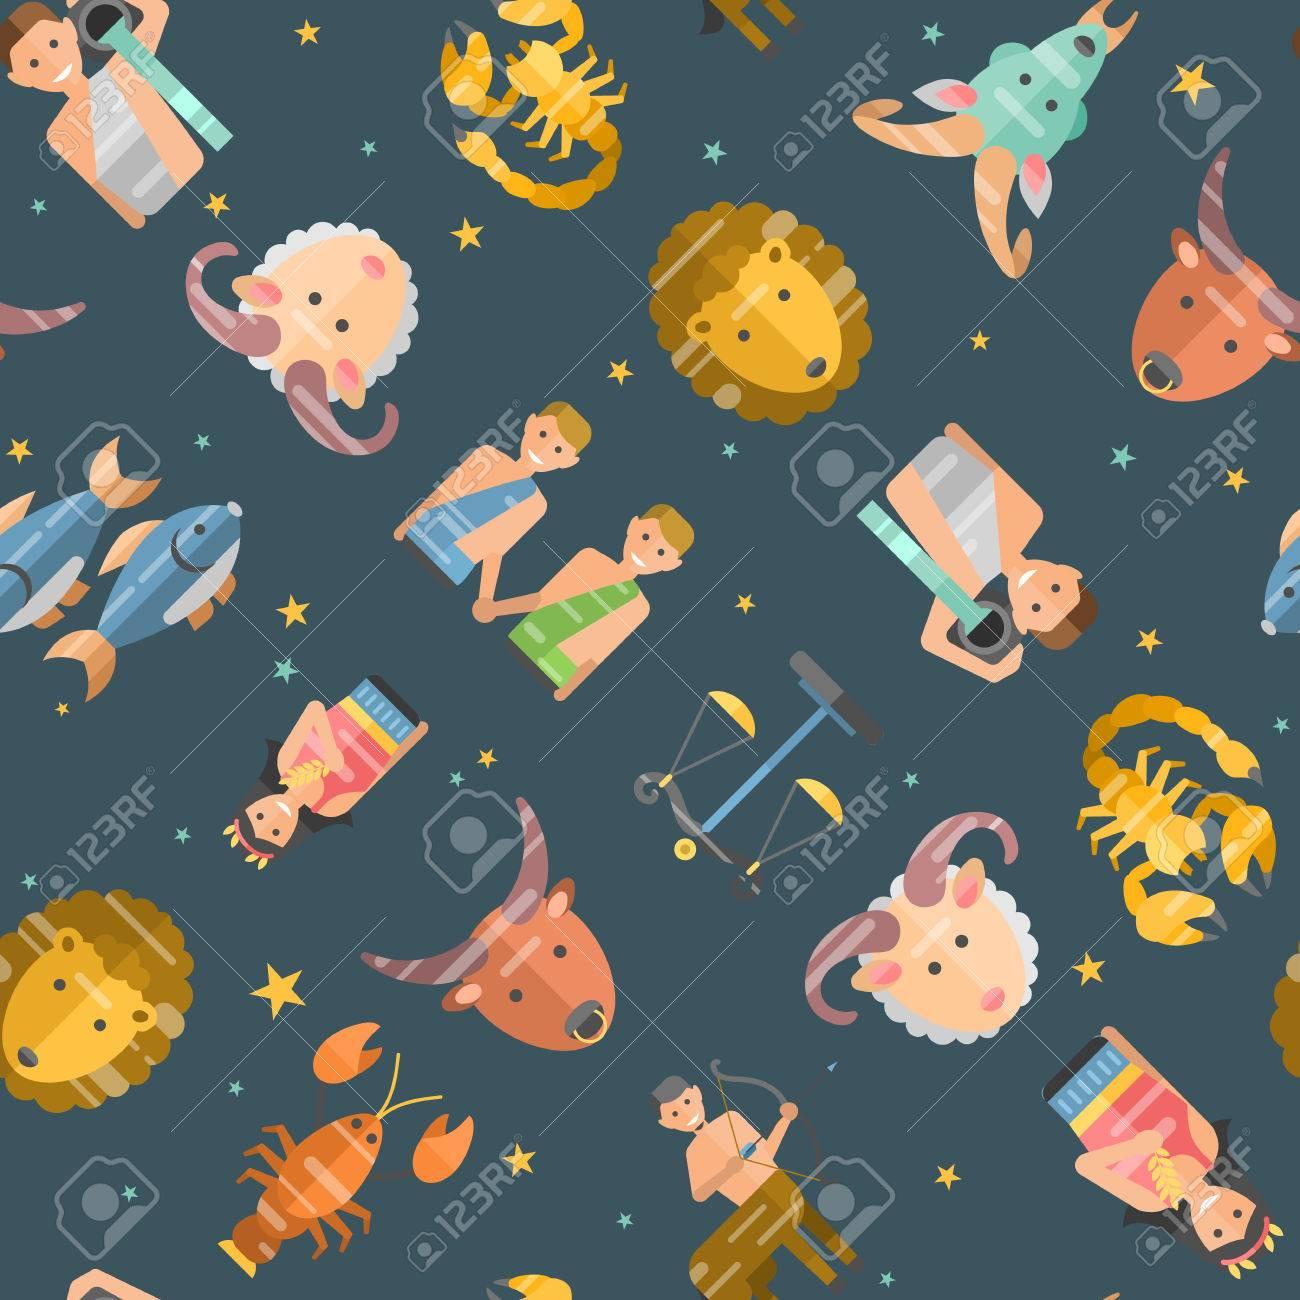 Zodiac Signs Flat Seamless Pattern Of Horoscope Symbols Star